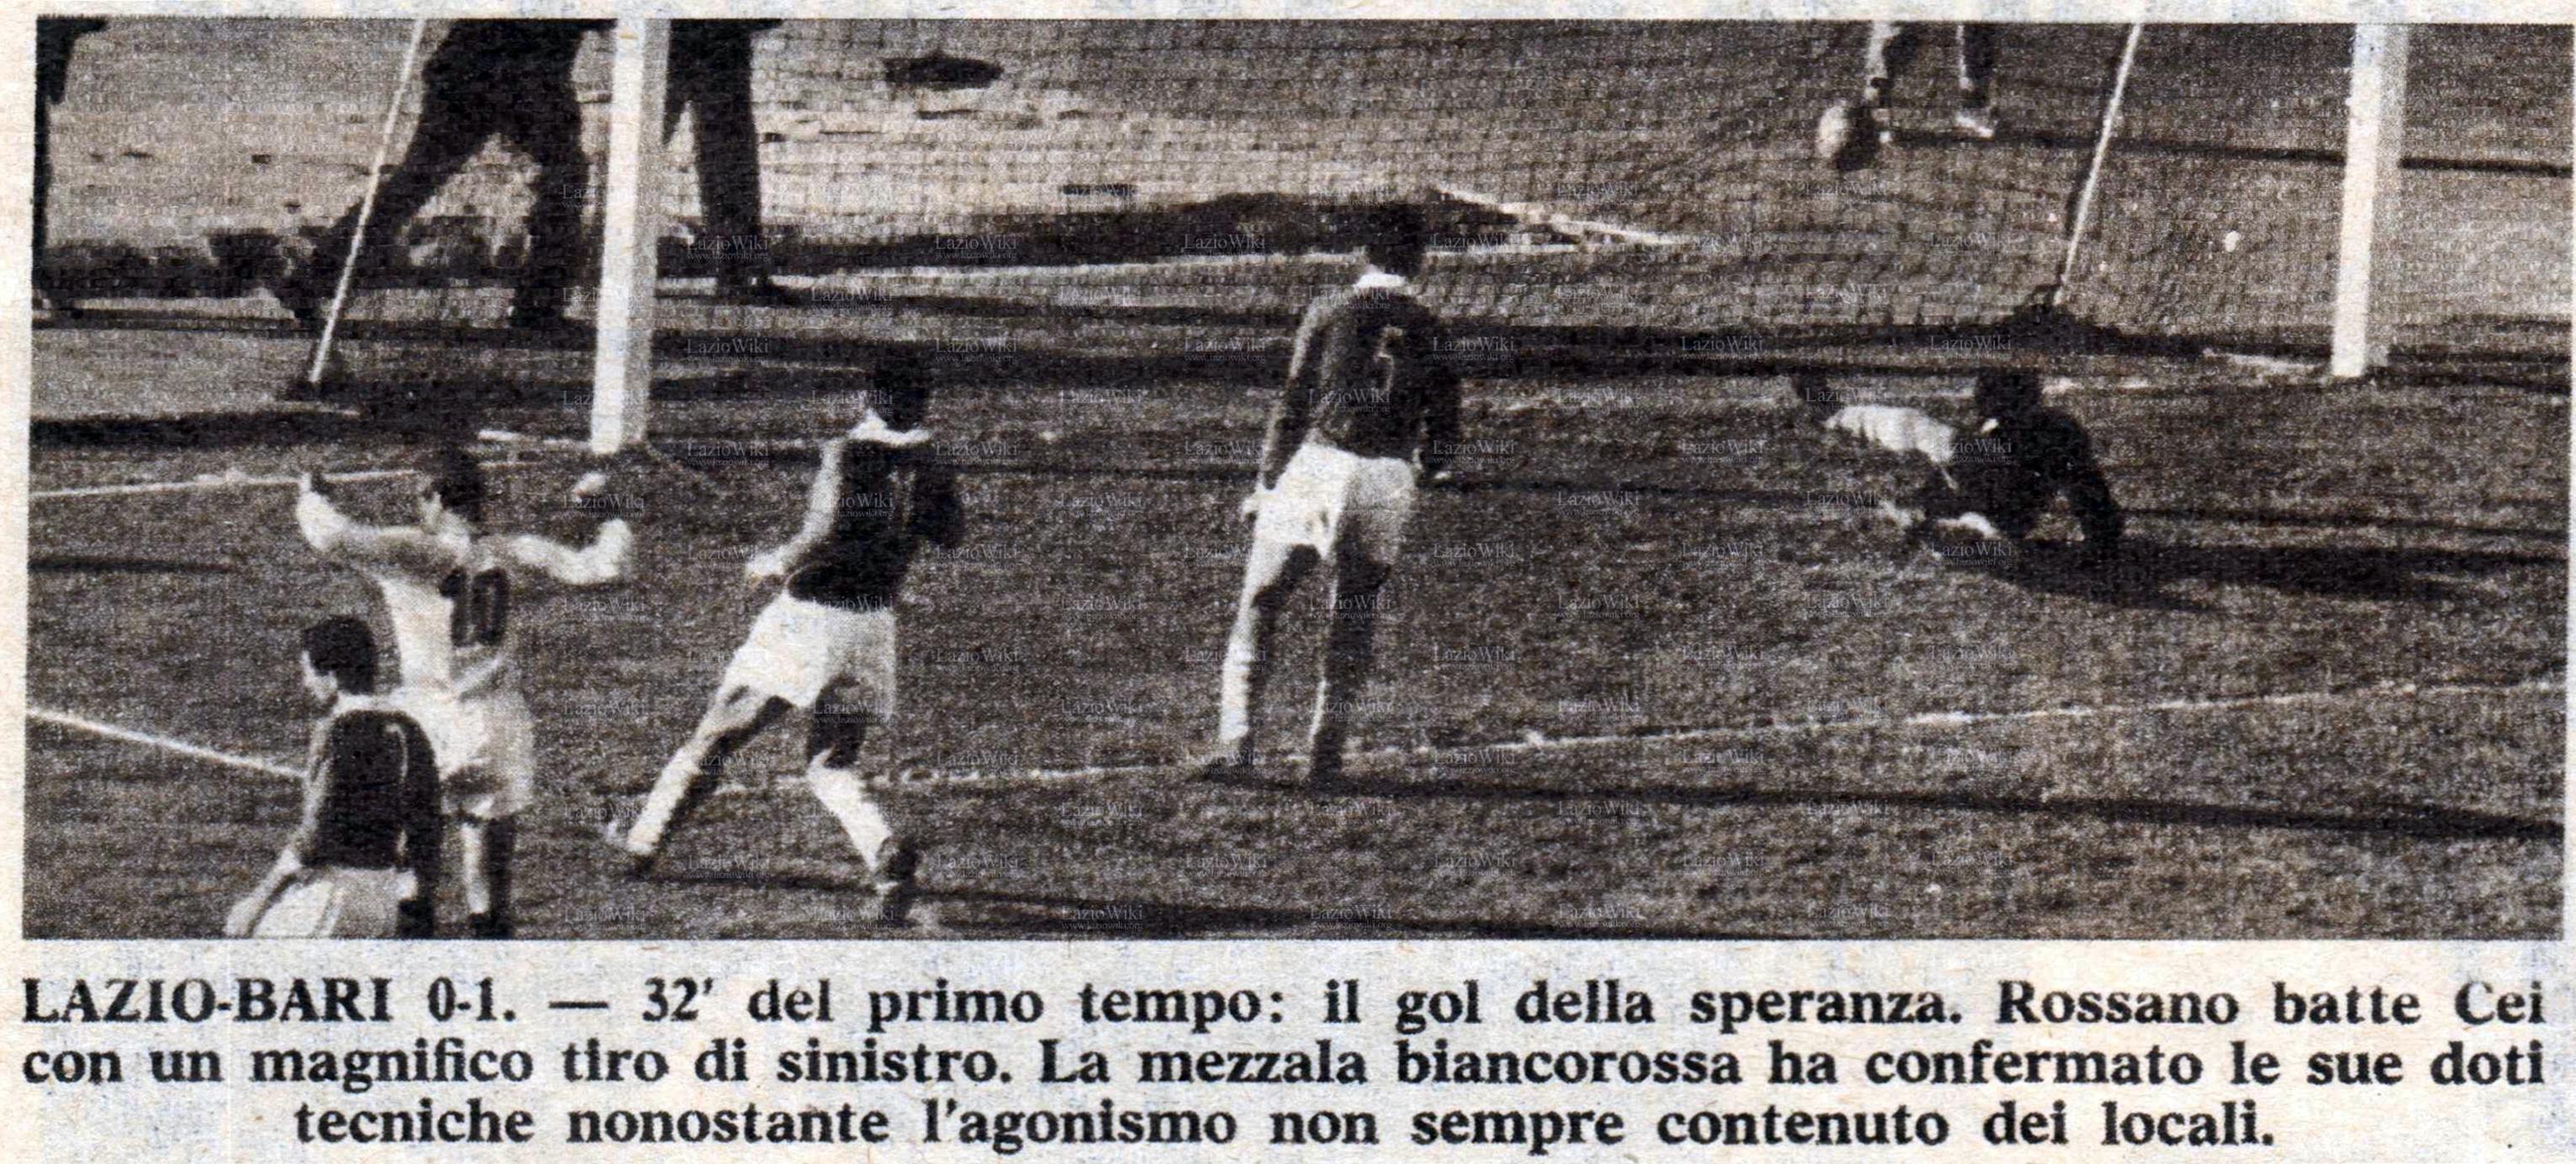 lazio-bari-1961-scandalo-wp2